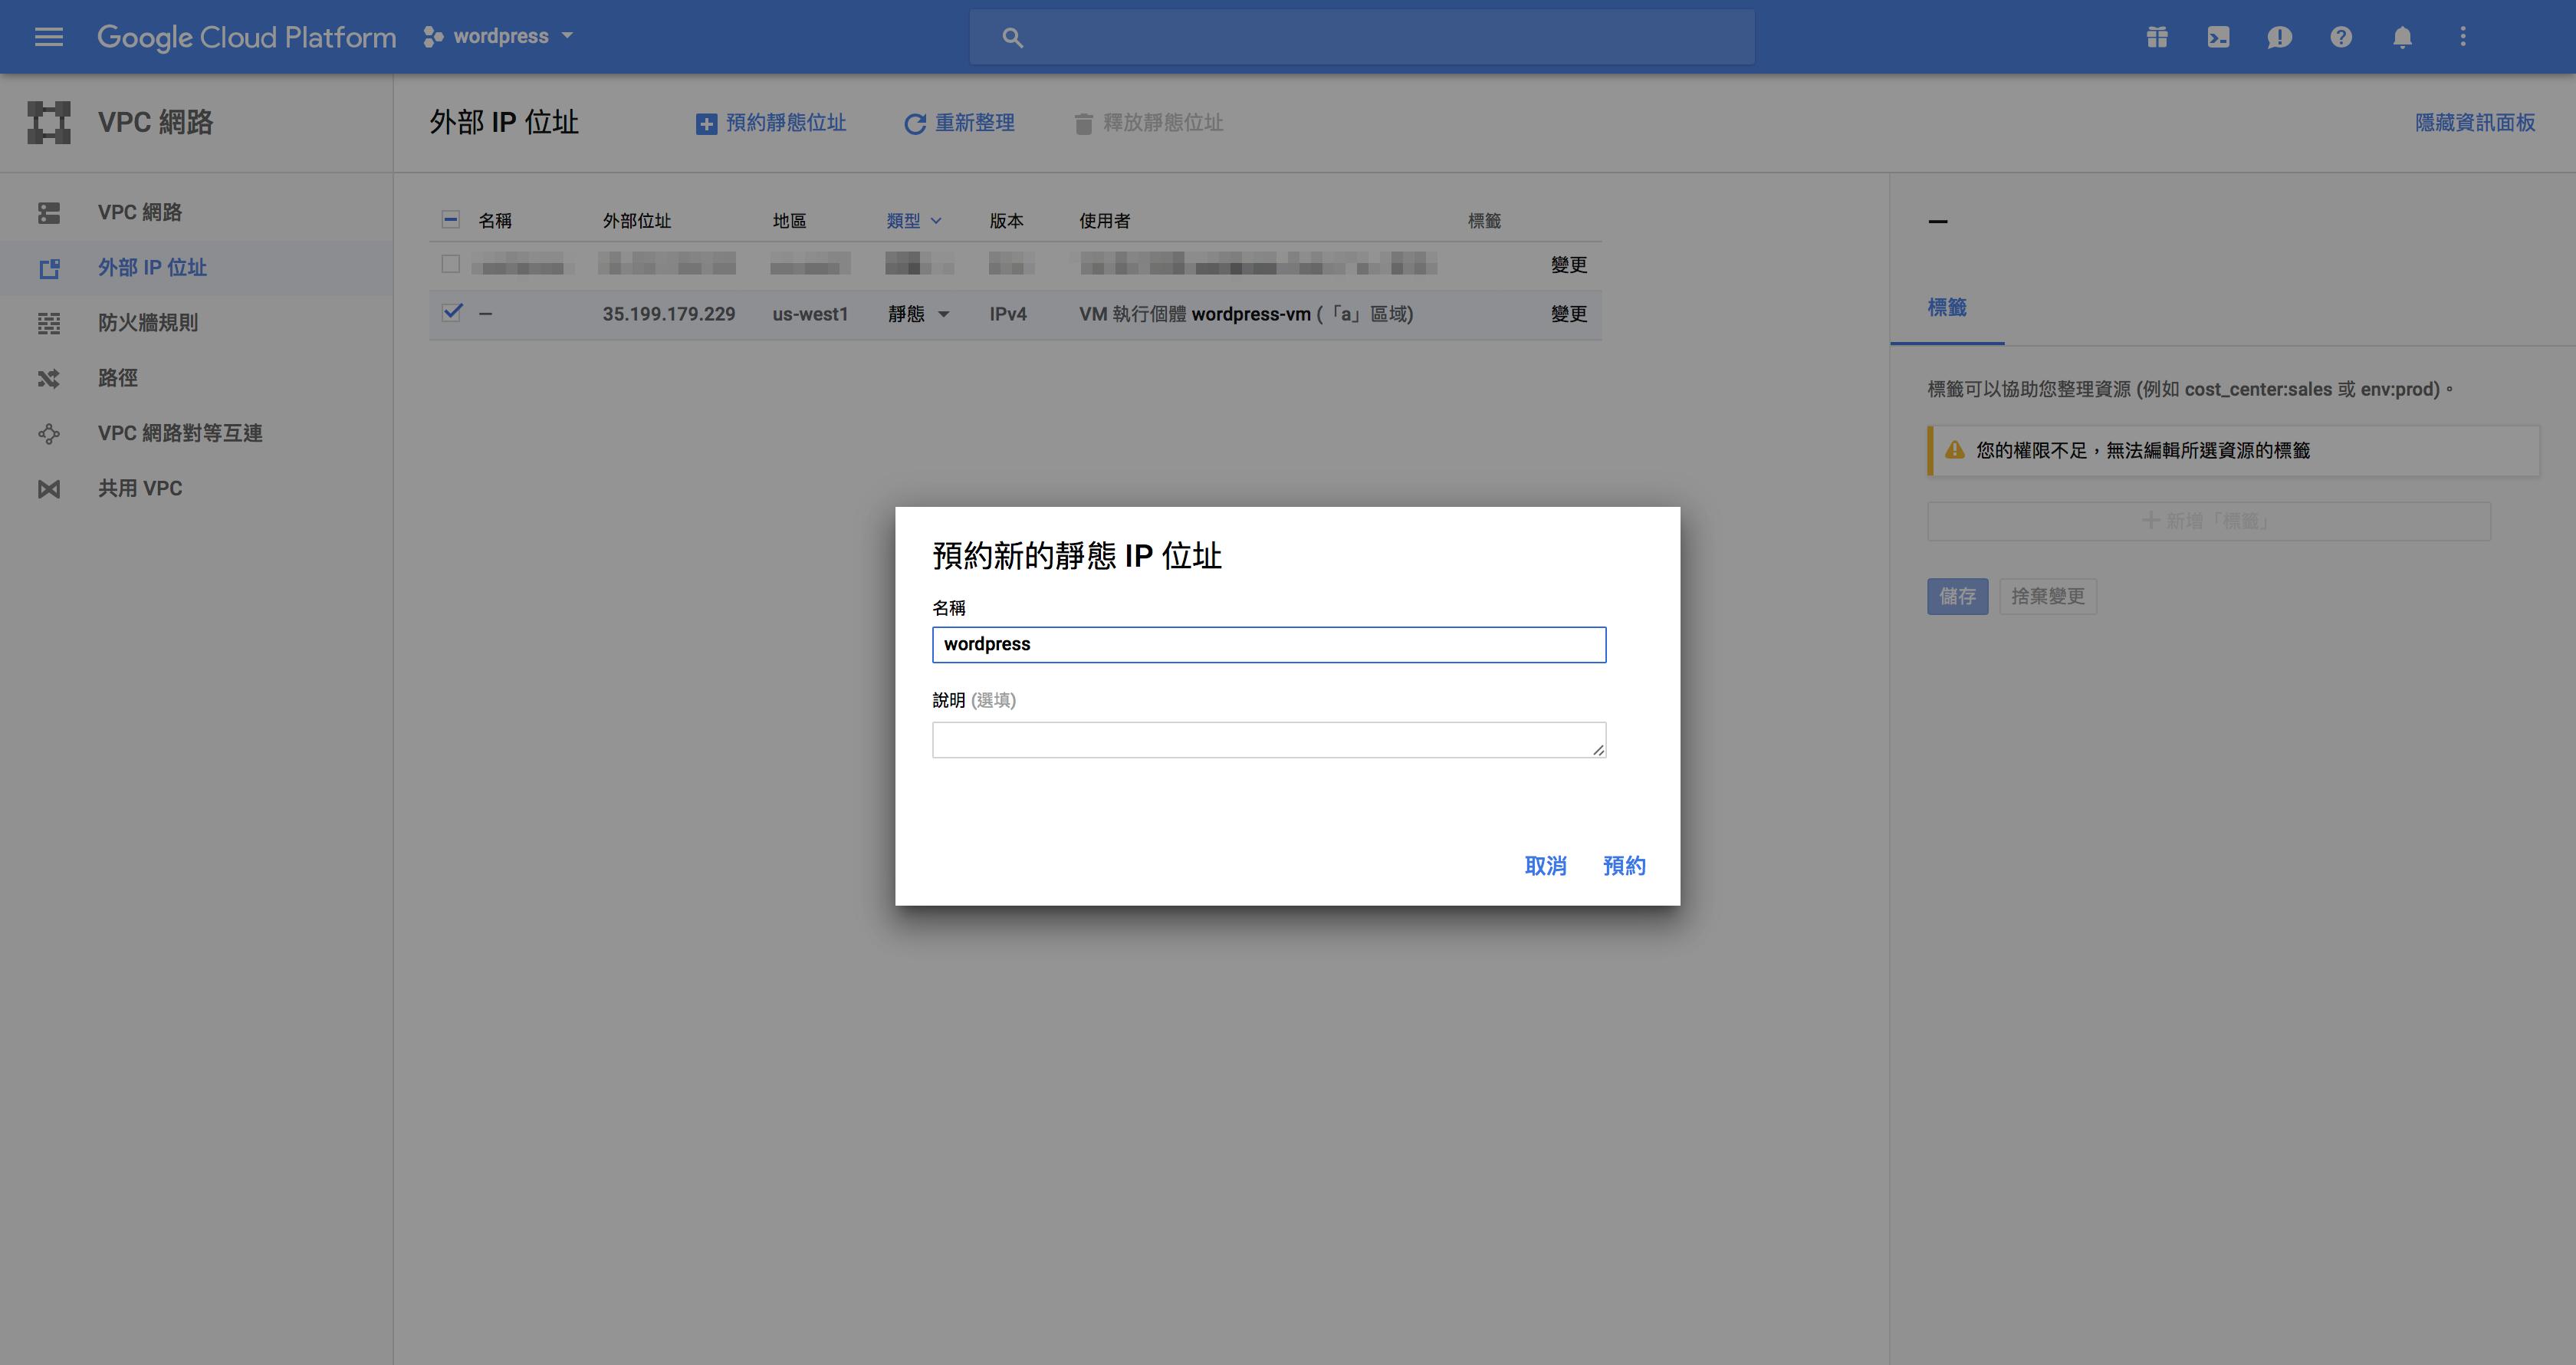 Google Cloud Console – VPC 網路設定靜態名稱